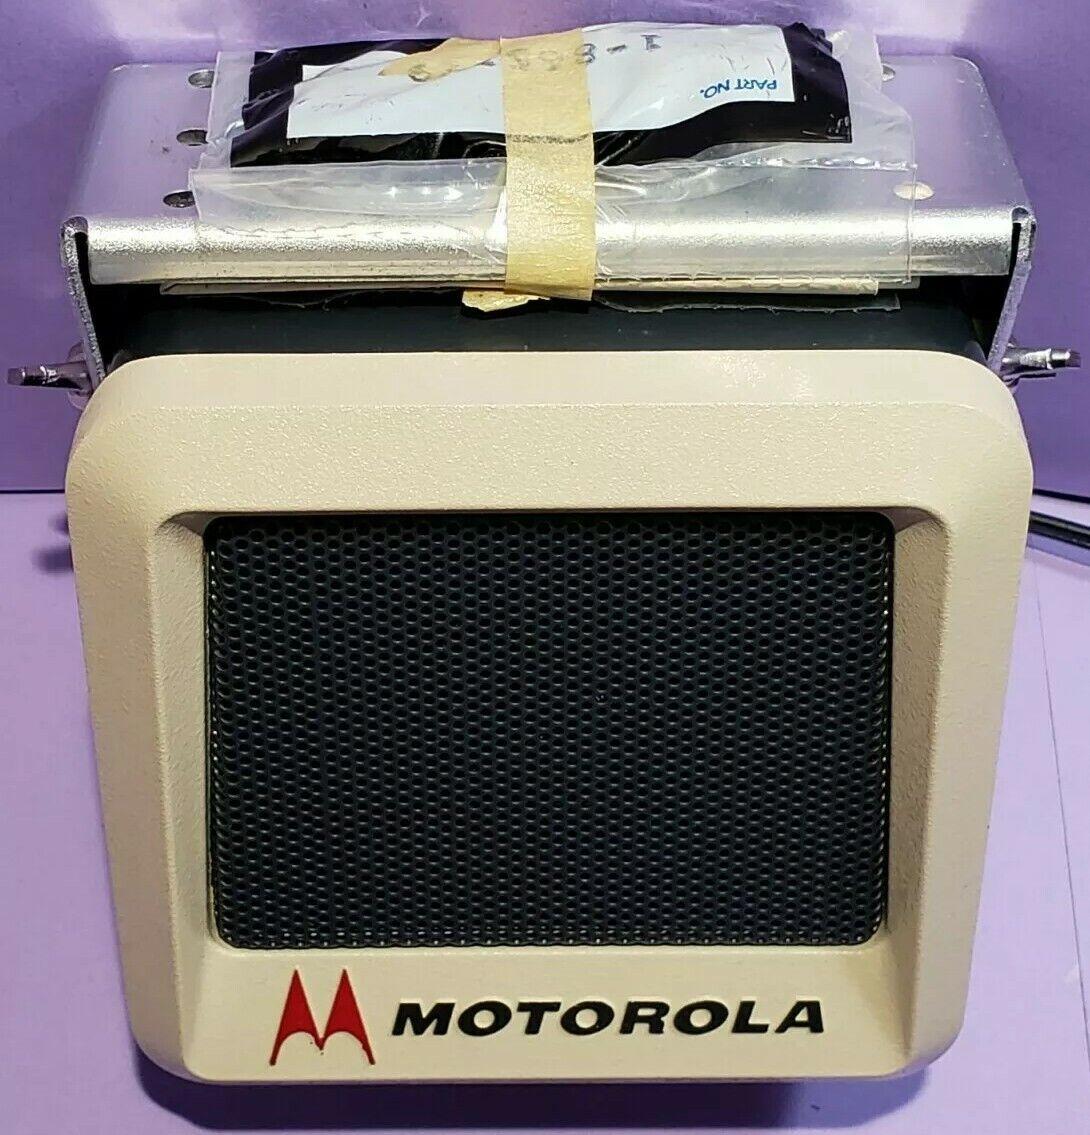 NOS Motorola vintage speaker 16-Pin GM300 Maxtrac CDM1250 Radius CM300 PM400. Buy it now for 375.00